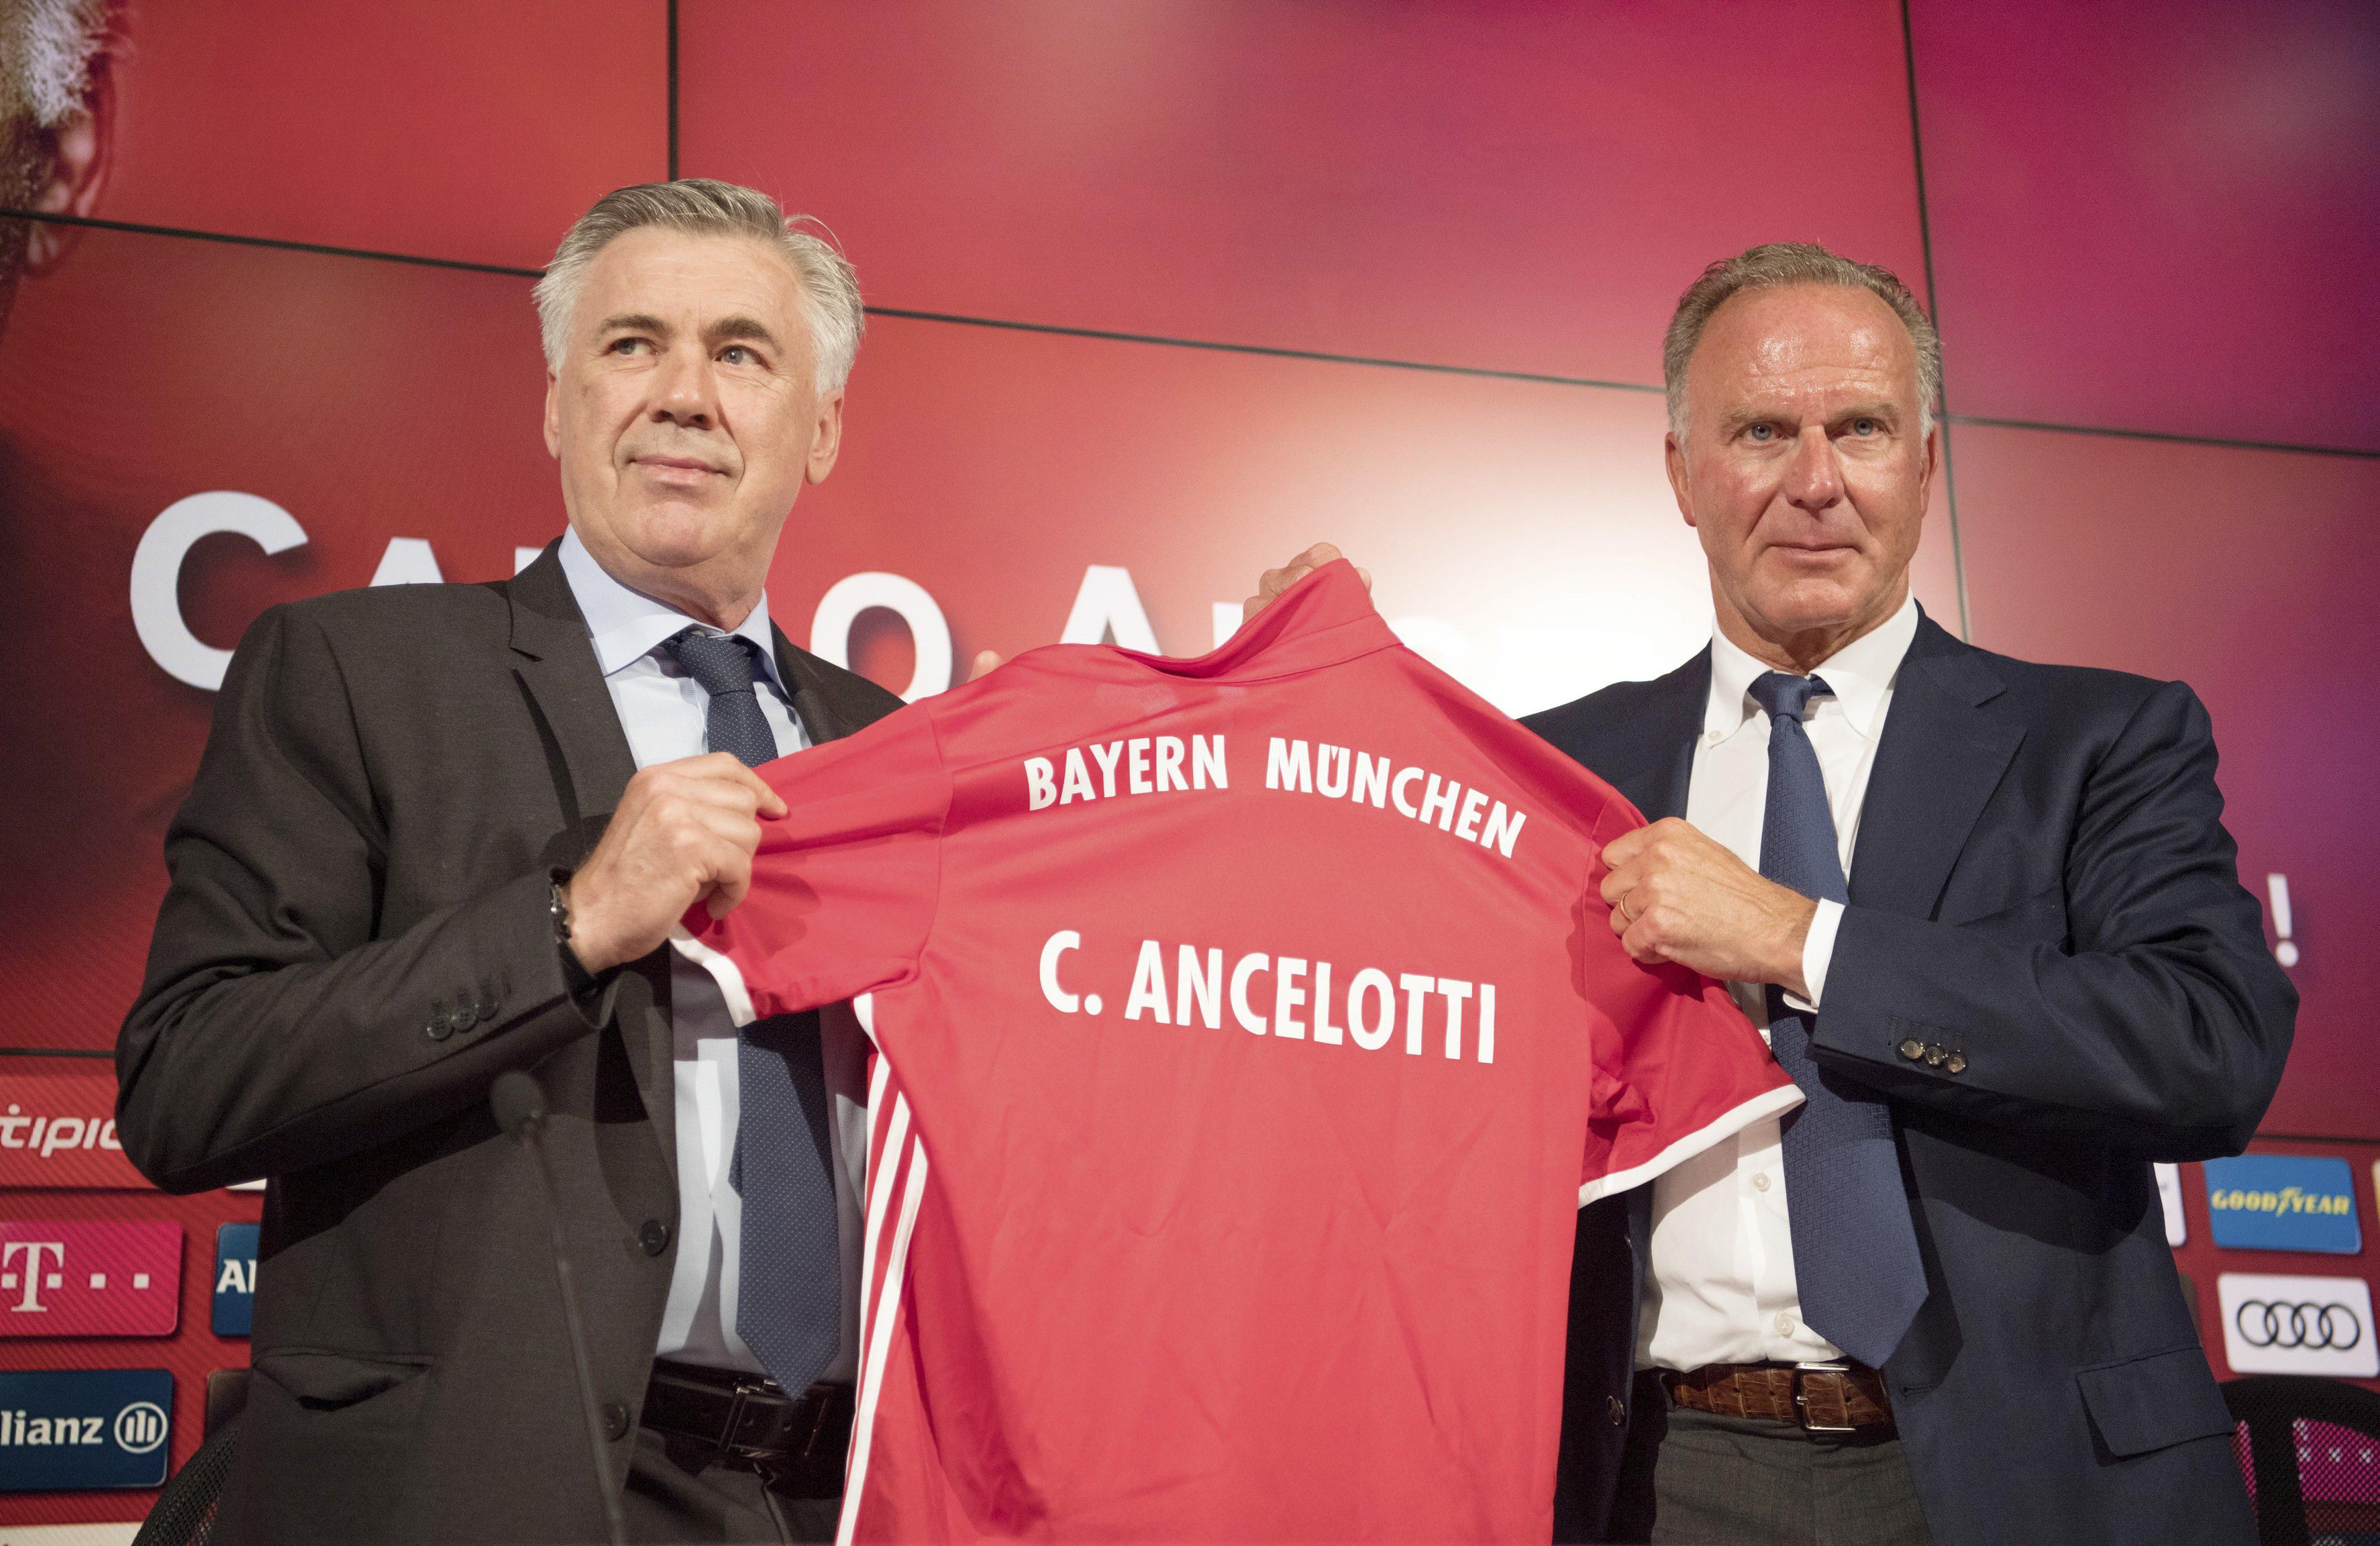 Bayern Munich chairman Karl-Heinz Rummenigge in tears when sacking Carlo Ancelotti